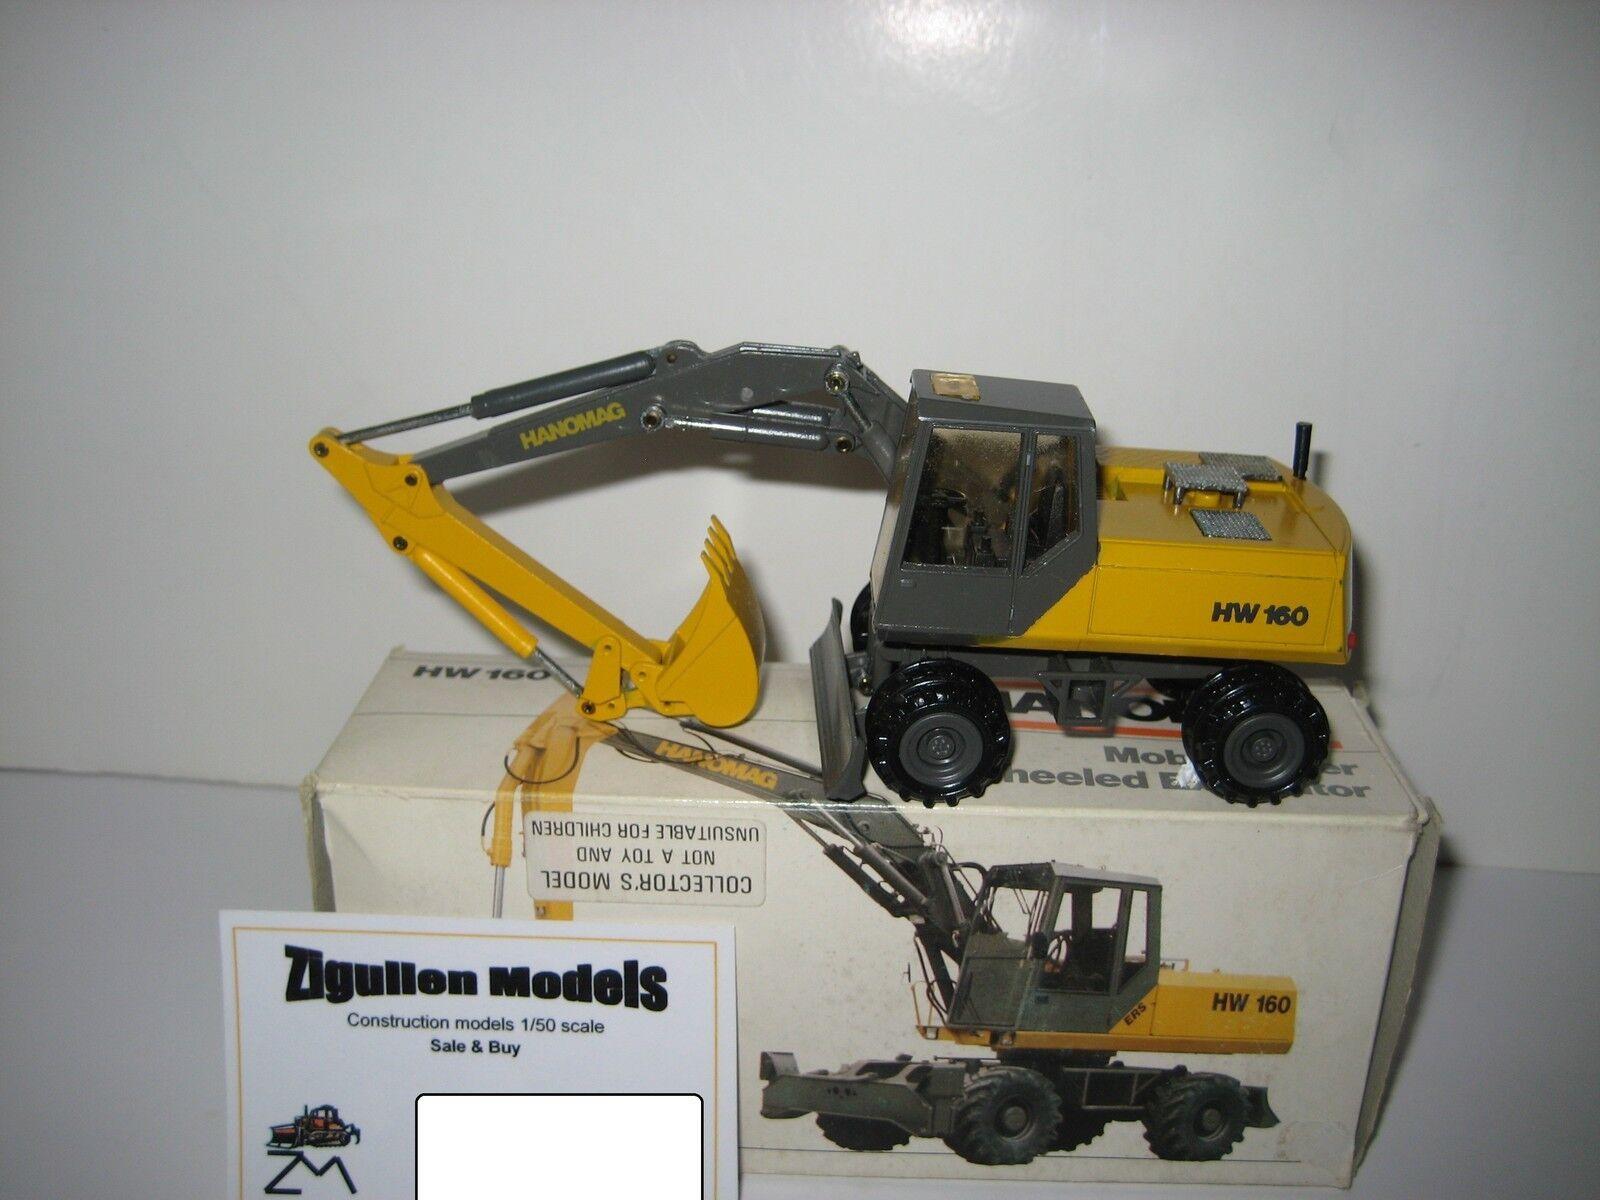 Hanomag HW 160 Excavateurs tieflöffel mobile Schlüter  2817.4 CONRAD 1 50 NEUF dans sa boîte